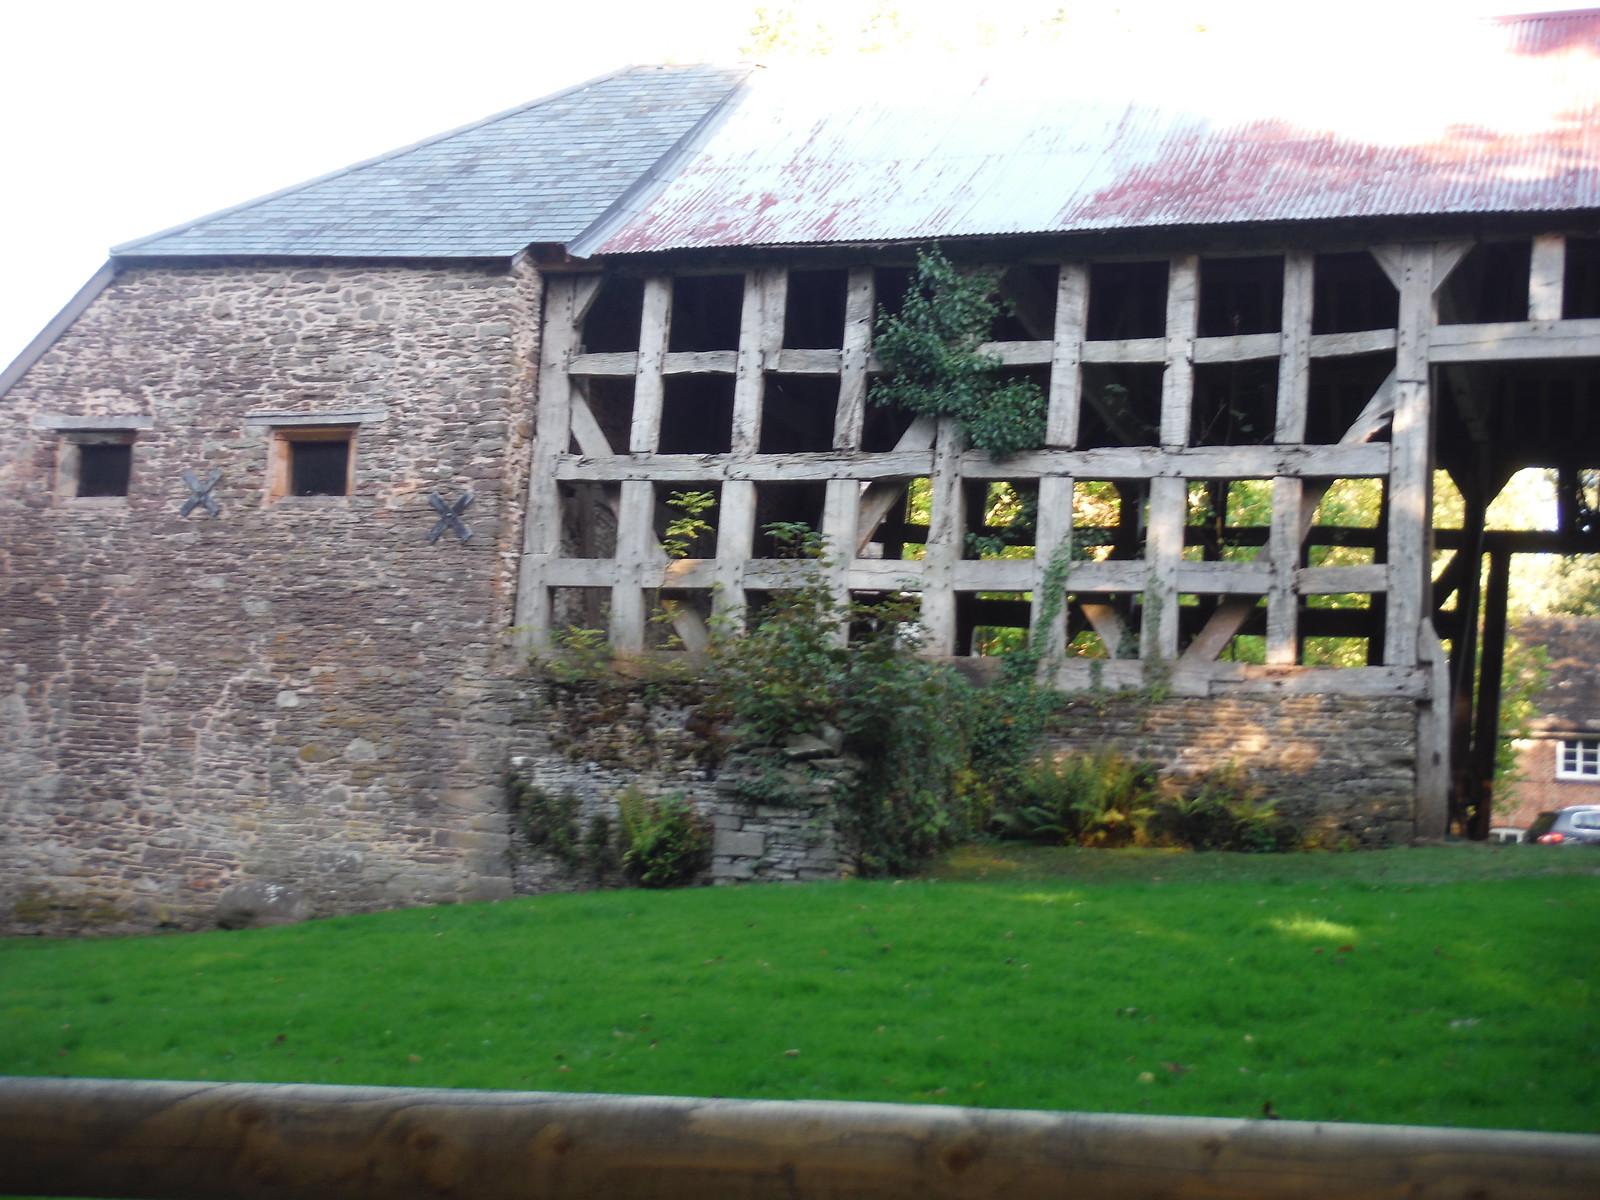 Barn at Llanvihangel Court SWC Walk 347 - Llanvihangel Crucorney Circular (via Bryn Arw and The Skirrid)